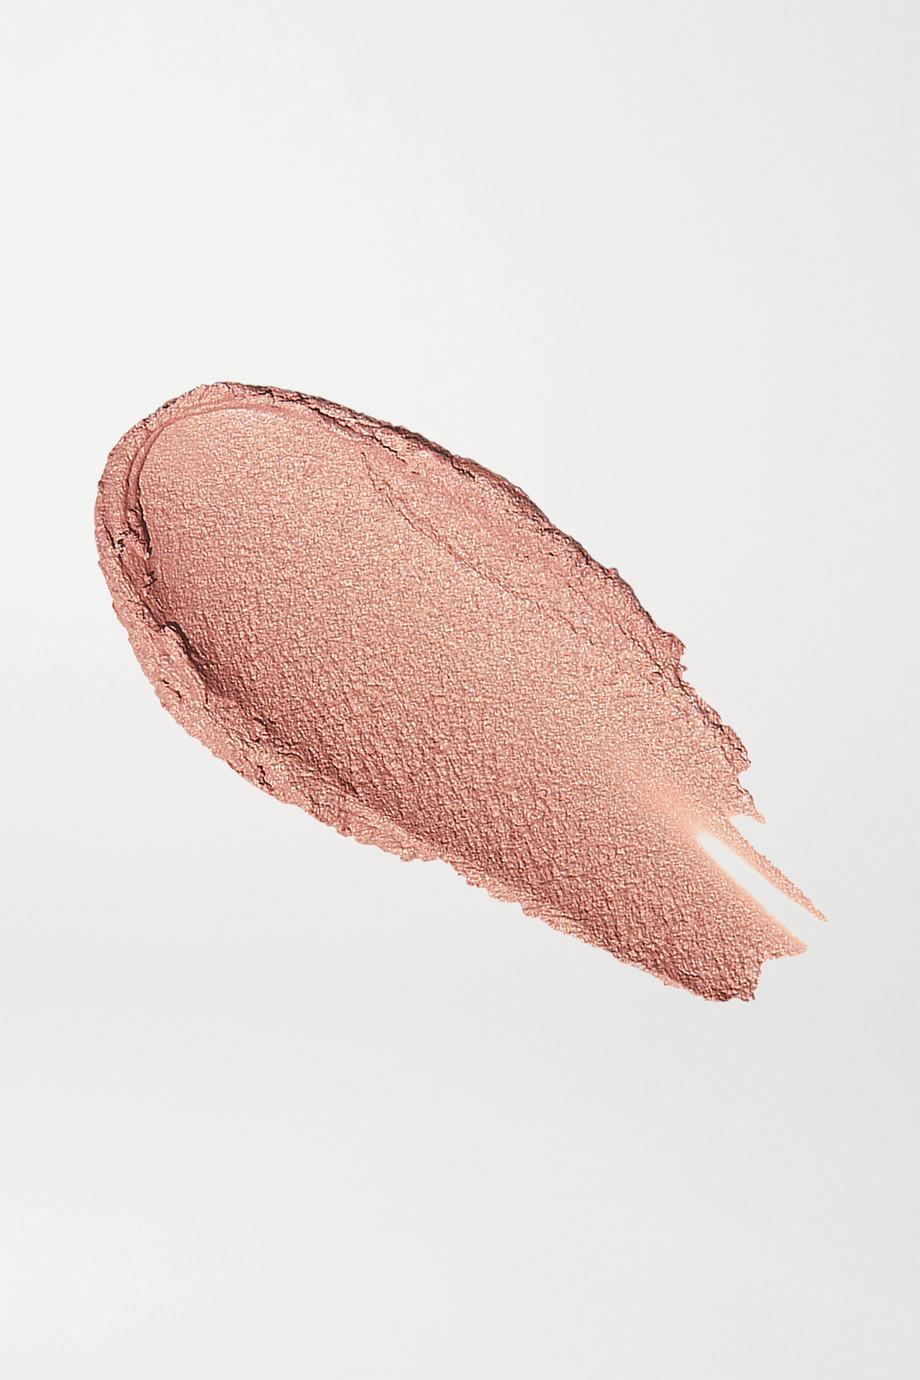 Supergoop! Shimmershade Eyeshadow SPF30 - Daydream